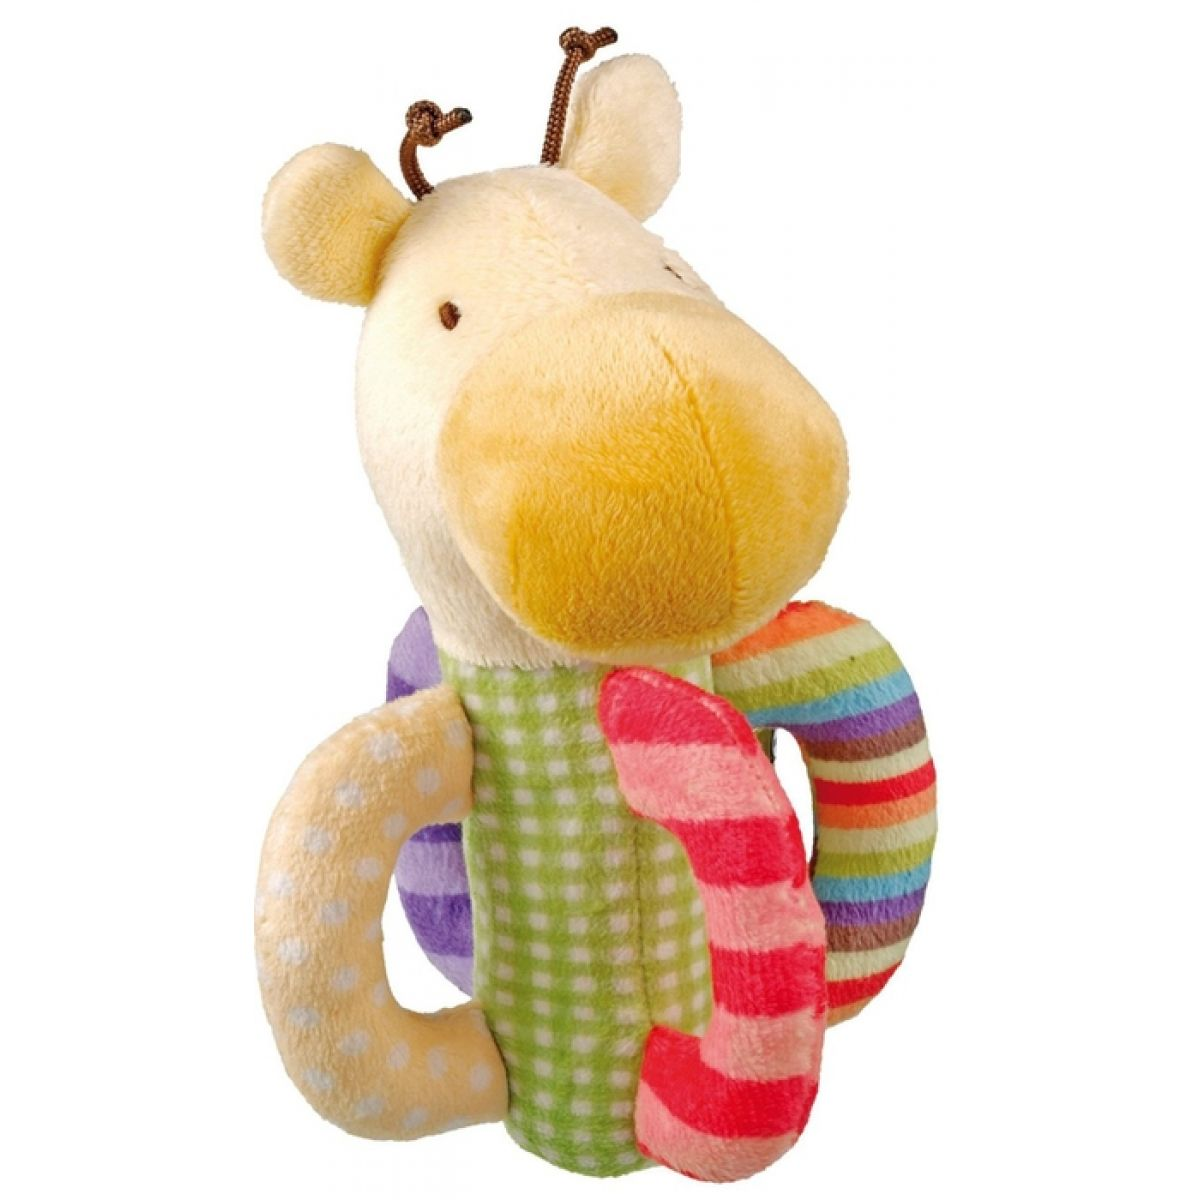 Fisher Price Chrastítko plyš žirafka s rolničkou